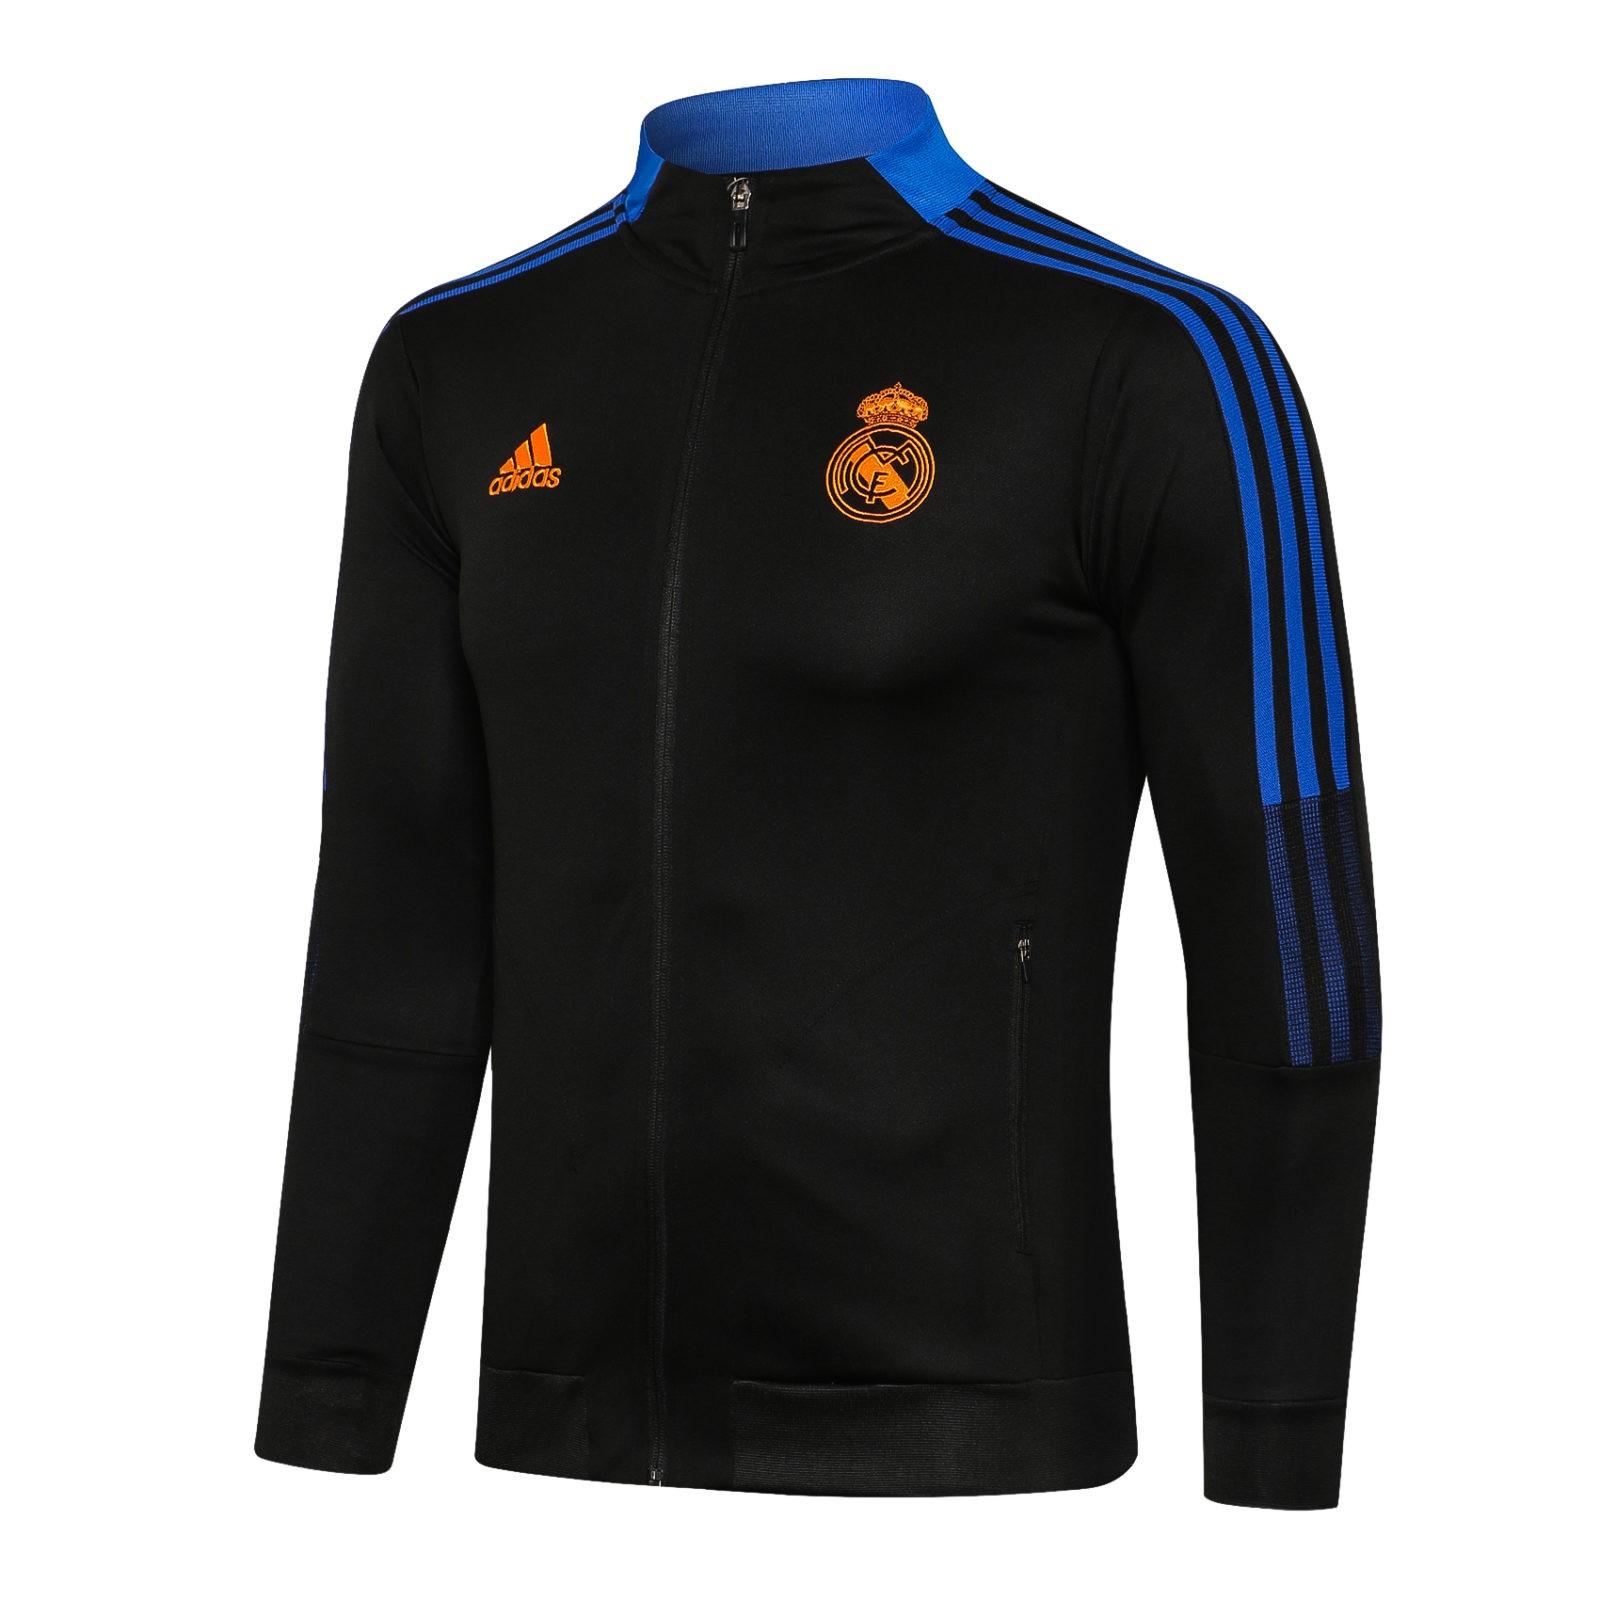 Олимпийка Реал Мадрид сезон 2021-2022 (Чёрная)